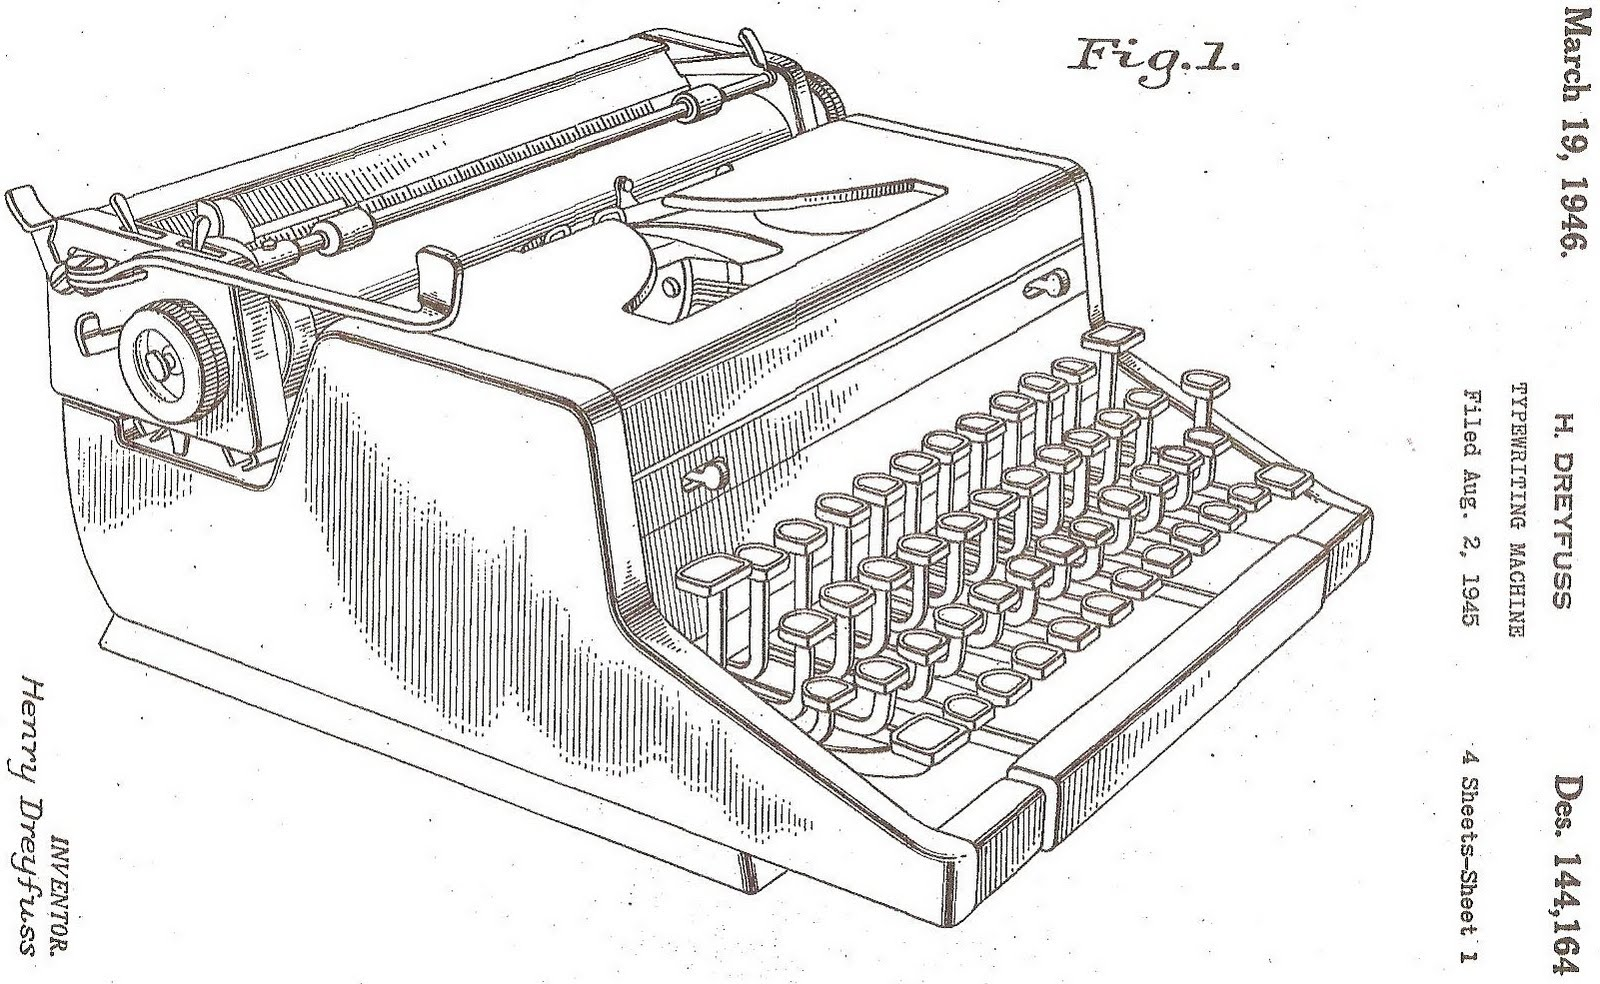 Oztypewriter On This Day In Typewriter History Lxxiv